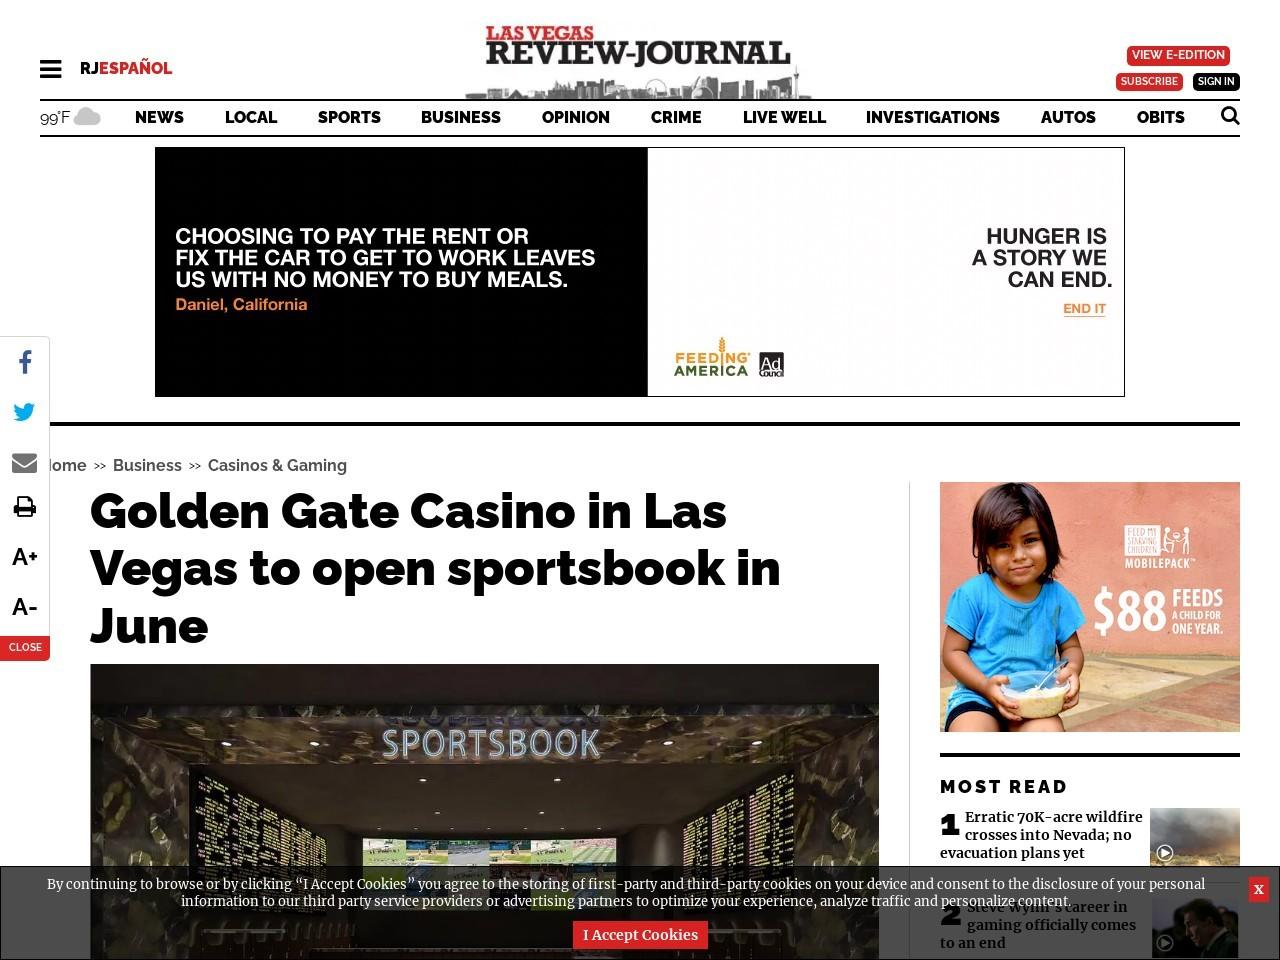 Golden Gate Casino expected to open sportsbook in June